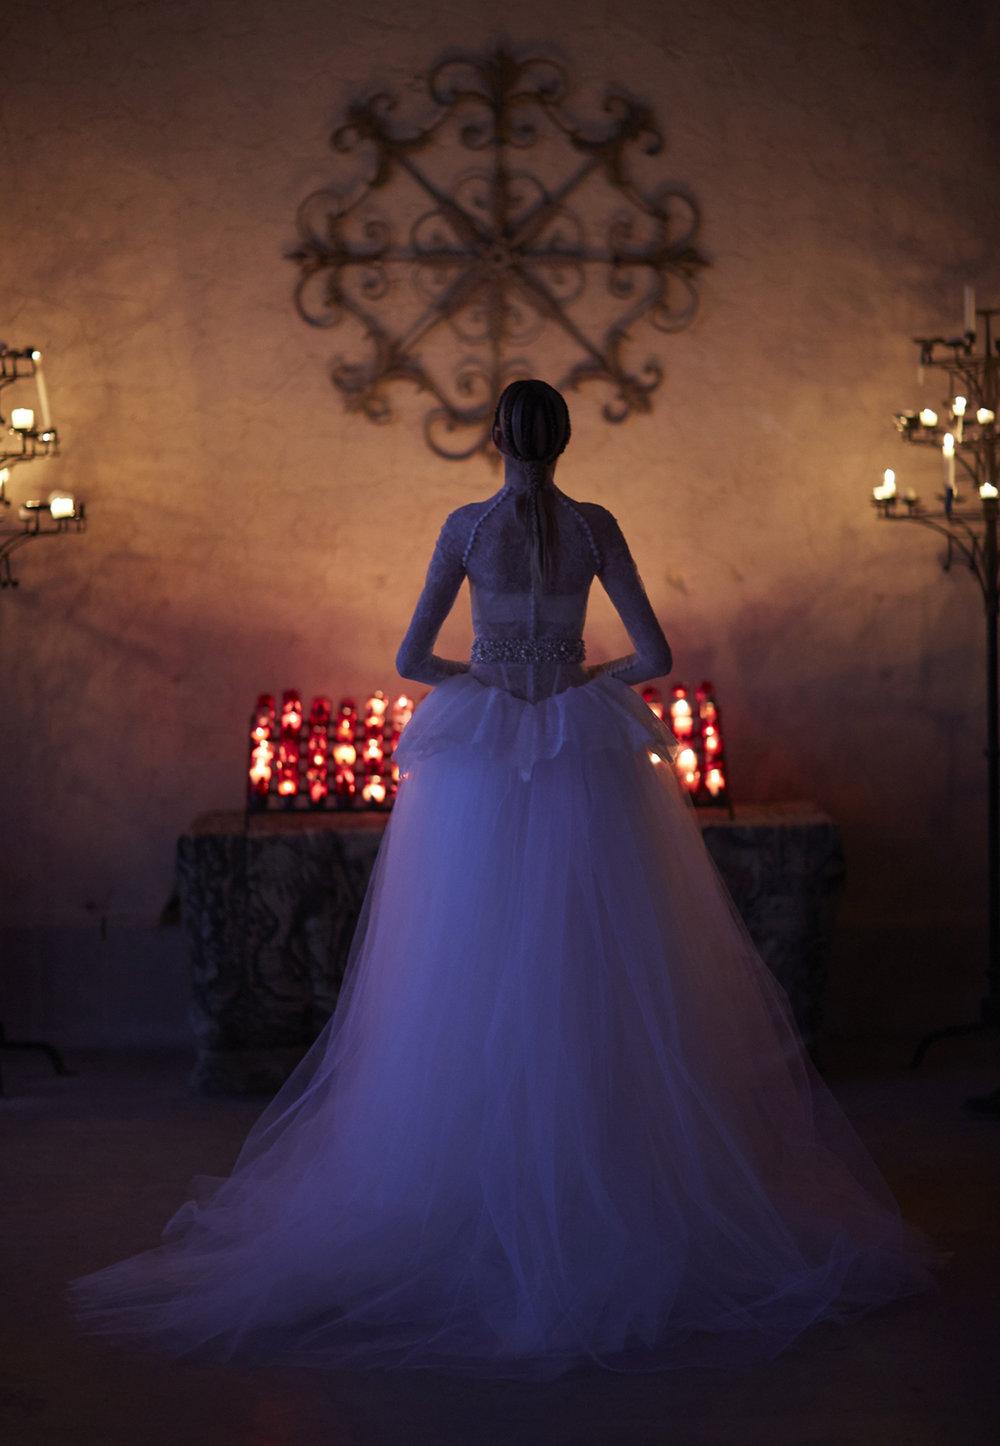 Season: Spring 2017    Gown name: Alden 高领口长袖公主大裙剪裁婚纱    Description: 高领口长袖公主大裙剪裁婚纱礼服,上身结合现代感剪裁和透视结构,薄纱 长袖以钟扣编上衫身,营造高贵氛围。新娘亦可脱下手袖,一条裙子有两种穿法。磅礡的 公主大裙摆,充满戏剧性的服装表达,飘散着十八世纪的宫廷复古味道。